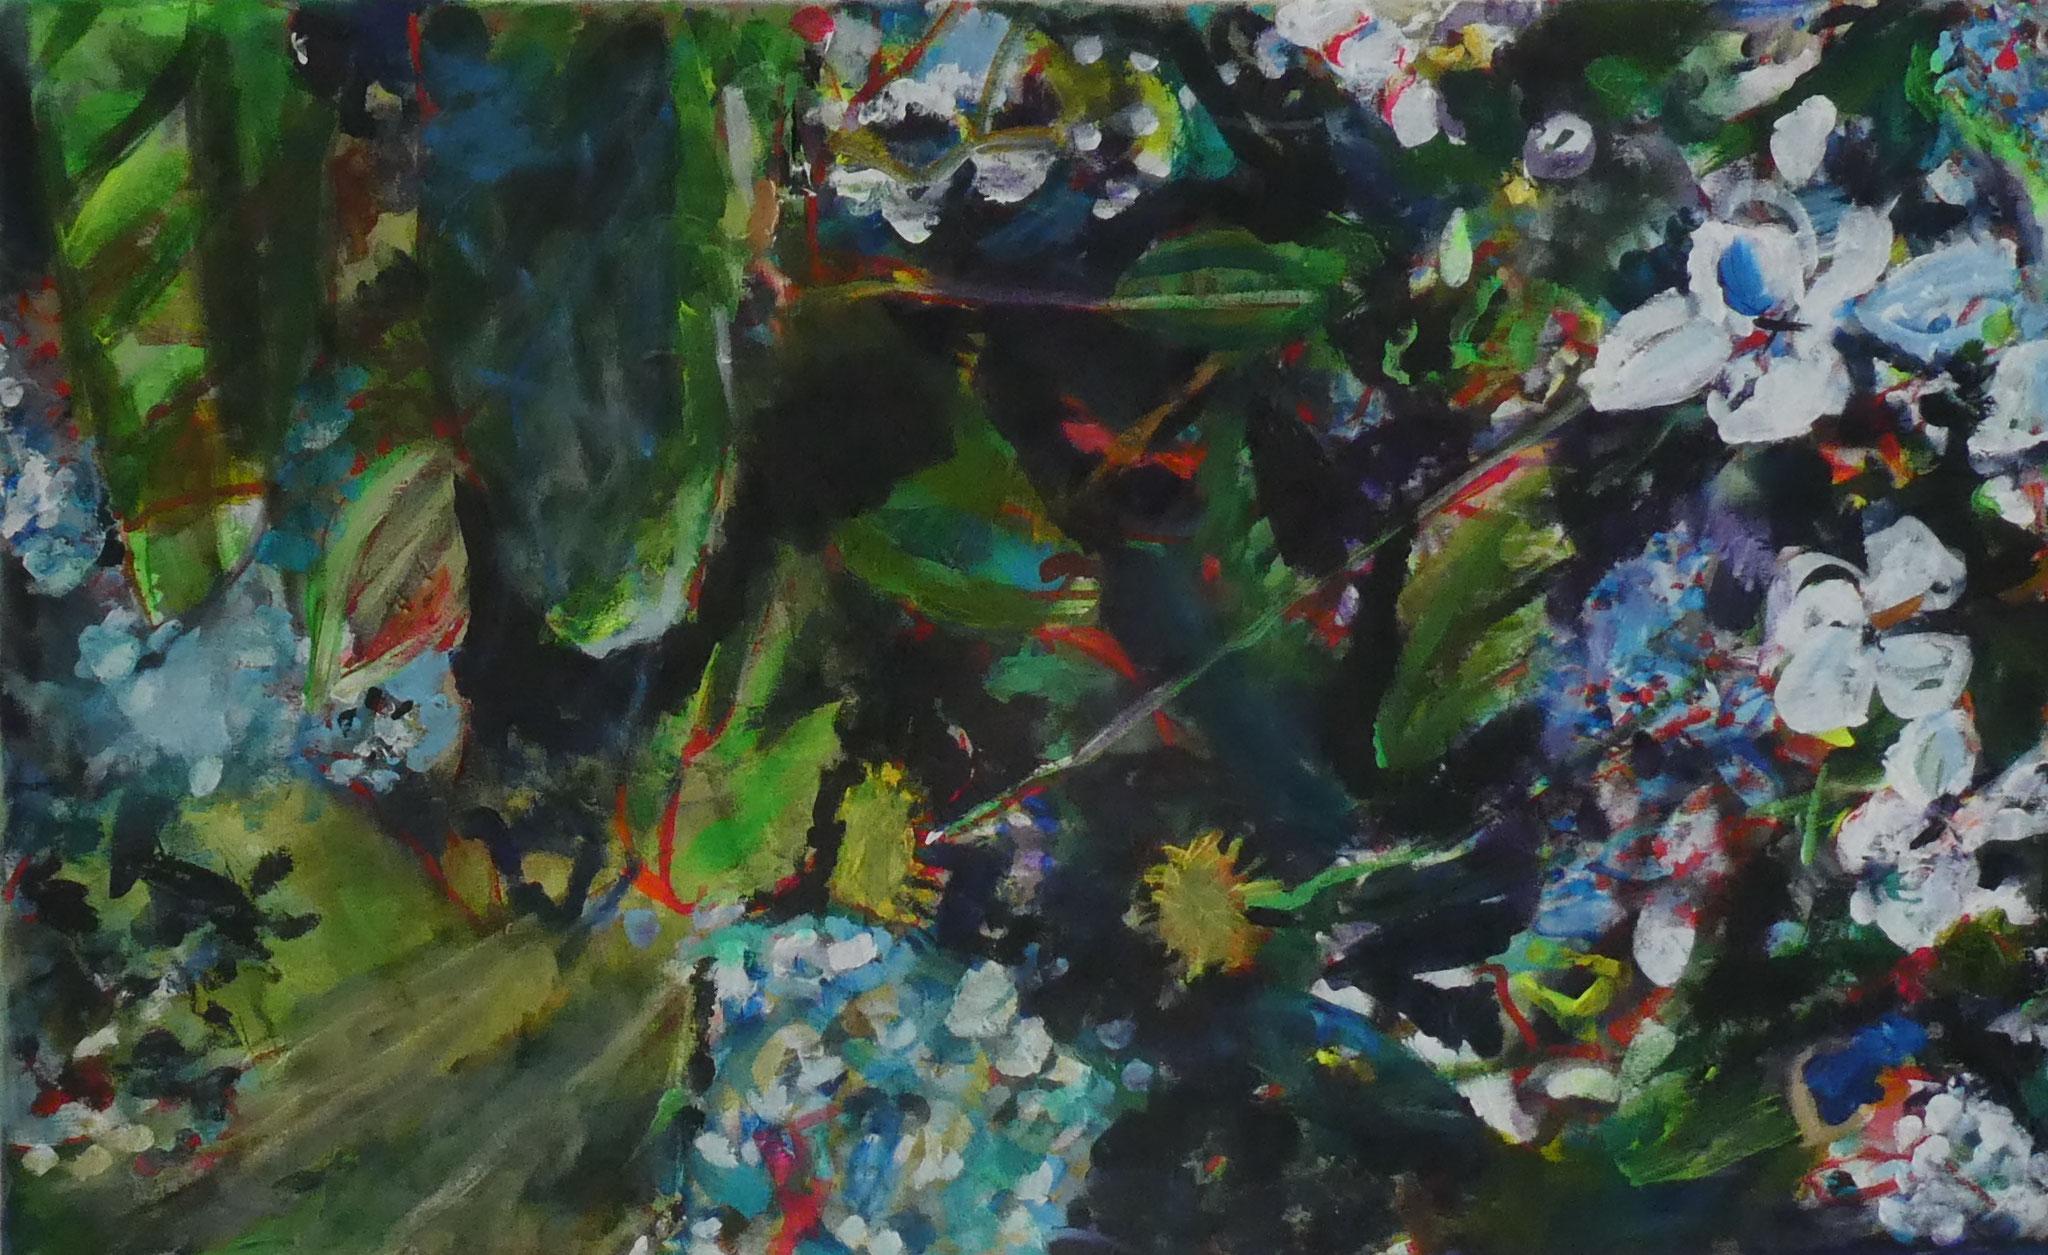 Hortensien 9,  60x100,  acrylic on canvas